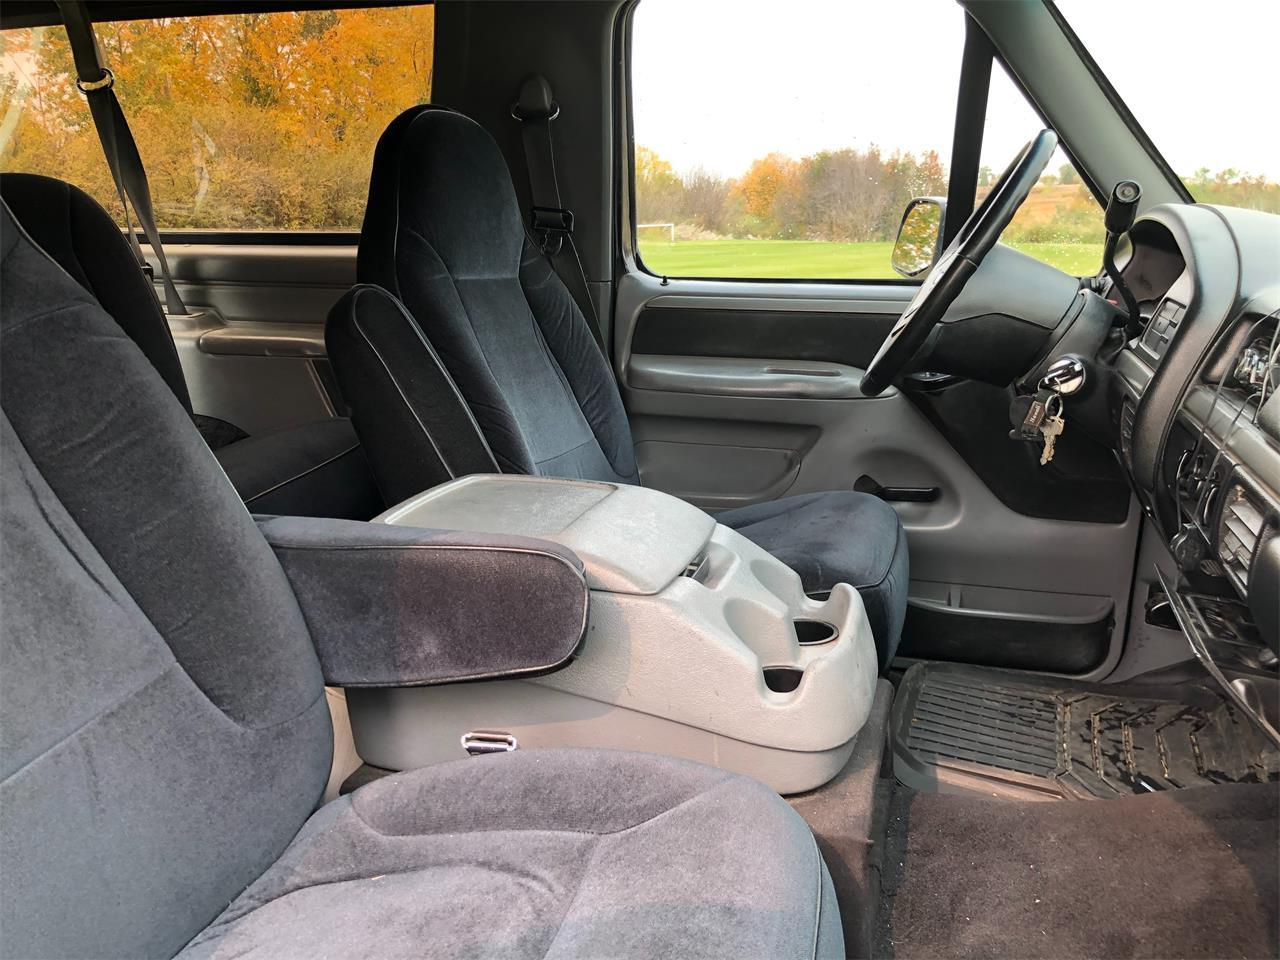 1993 Ford Bronco (CC-1390627) for sale in Carievale, Saskatchewan